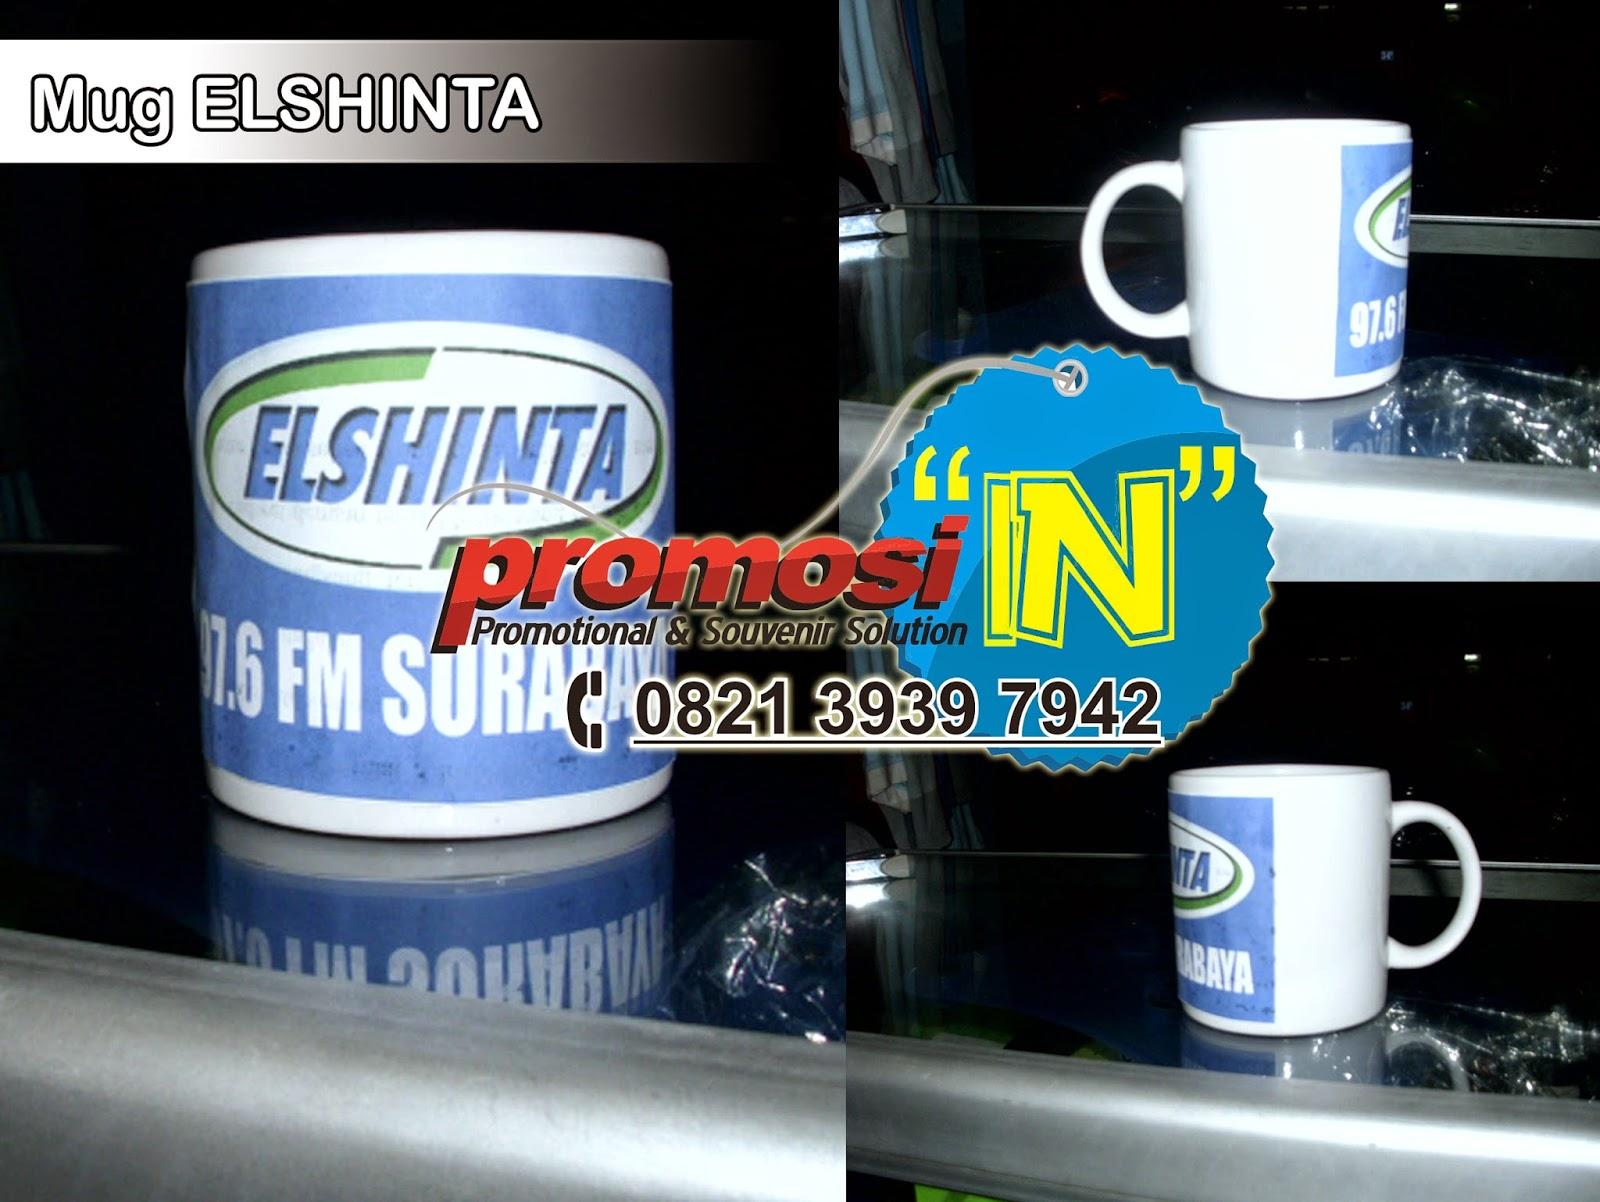 Mug Promosi Murah, Jual Mug Promosi, Mug Souvenir, Mug Sablon, Mug Press